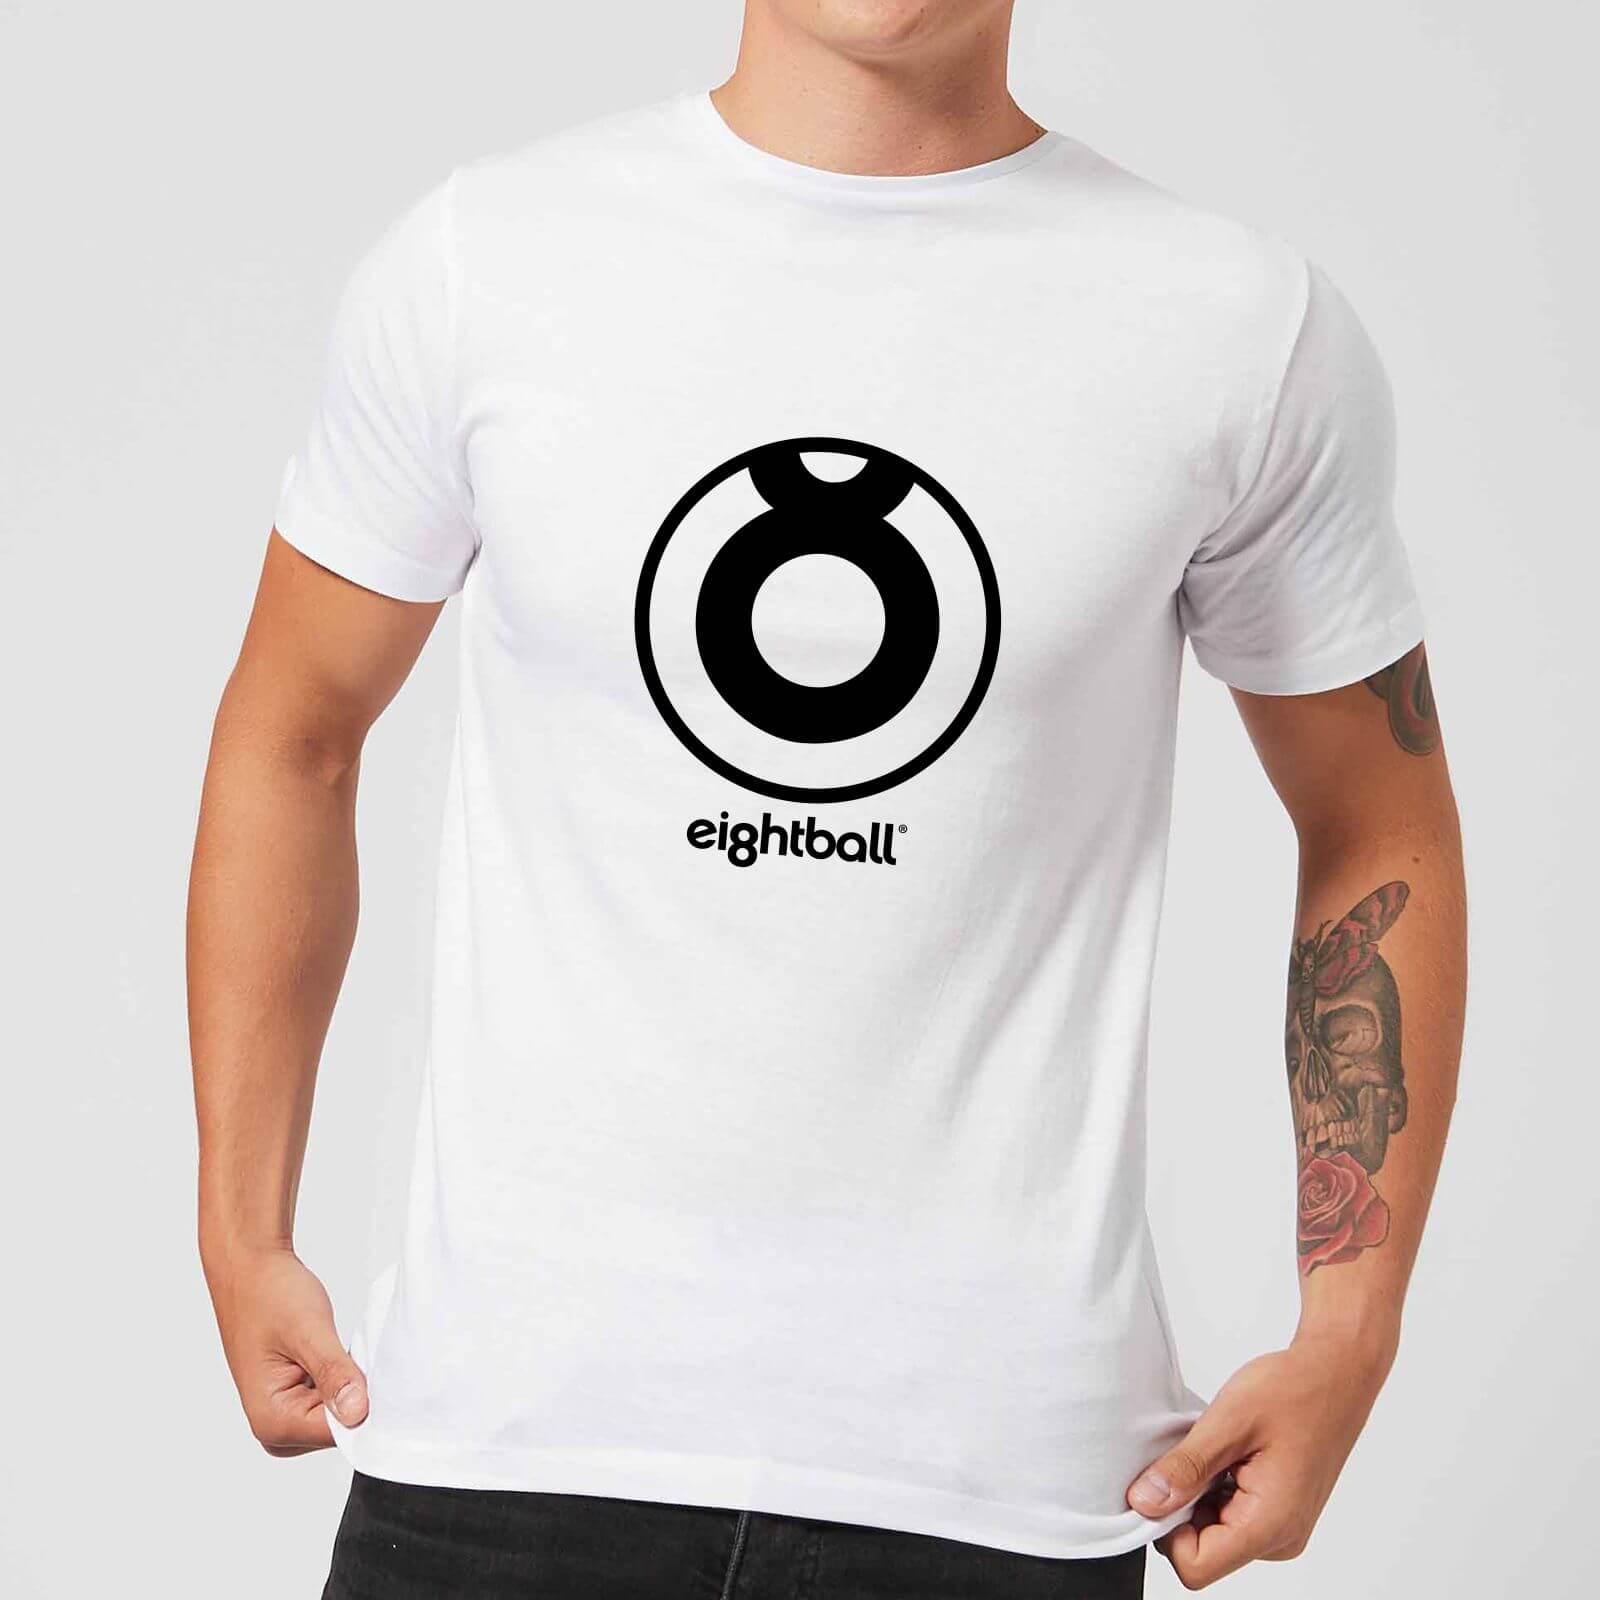 a7f31ab71 Ei8htball Large Circle Logo Men's T-Shirt - White Merchandise | Zavvi